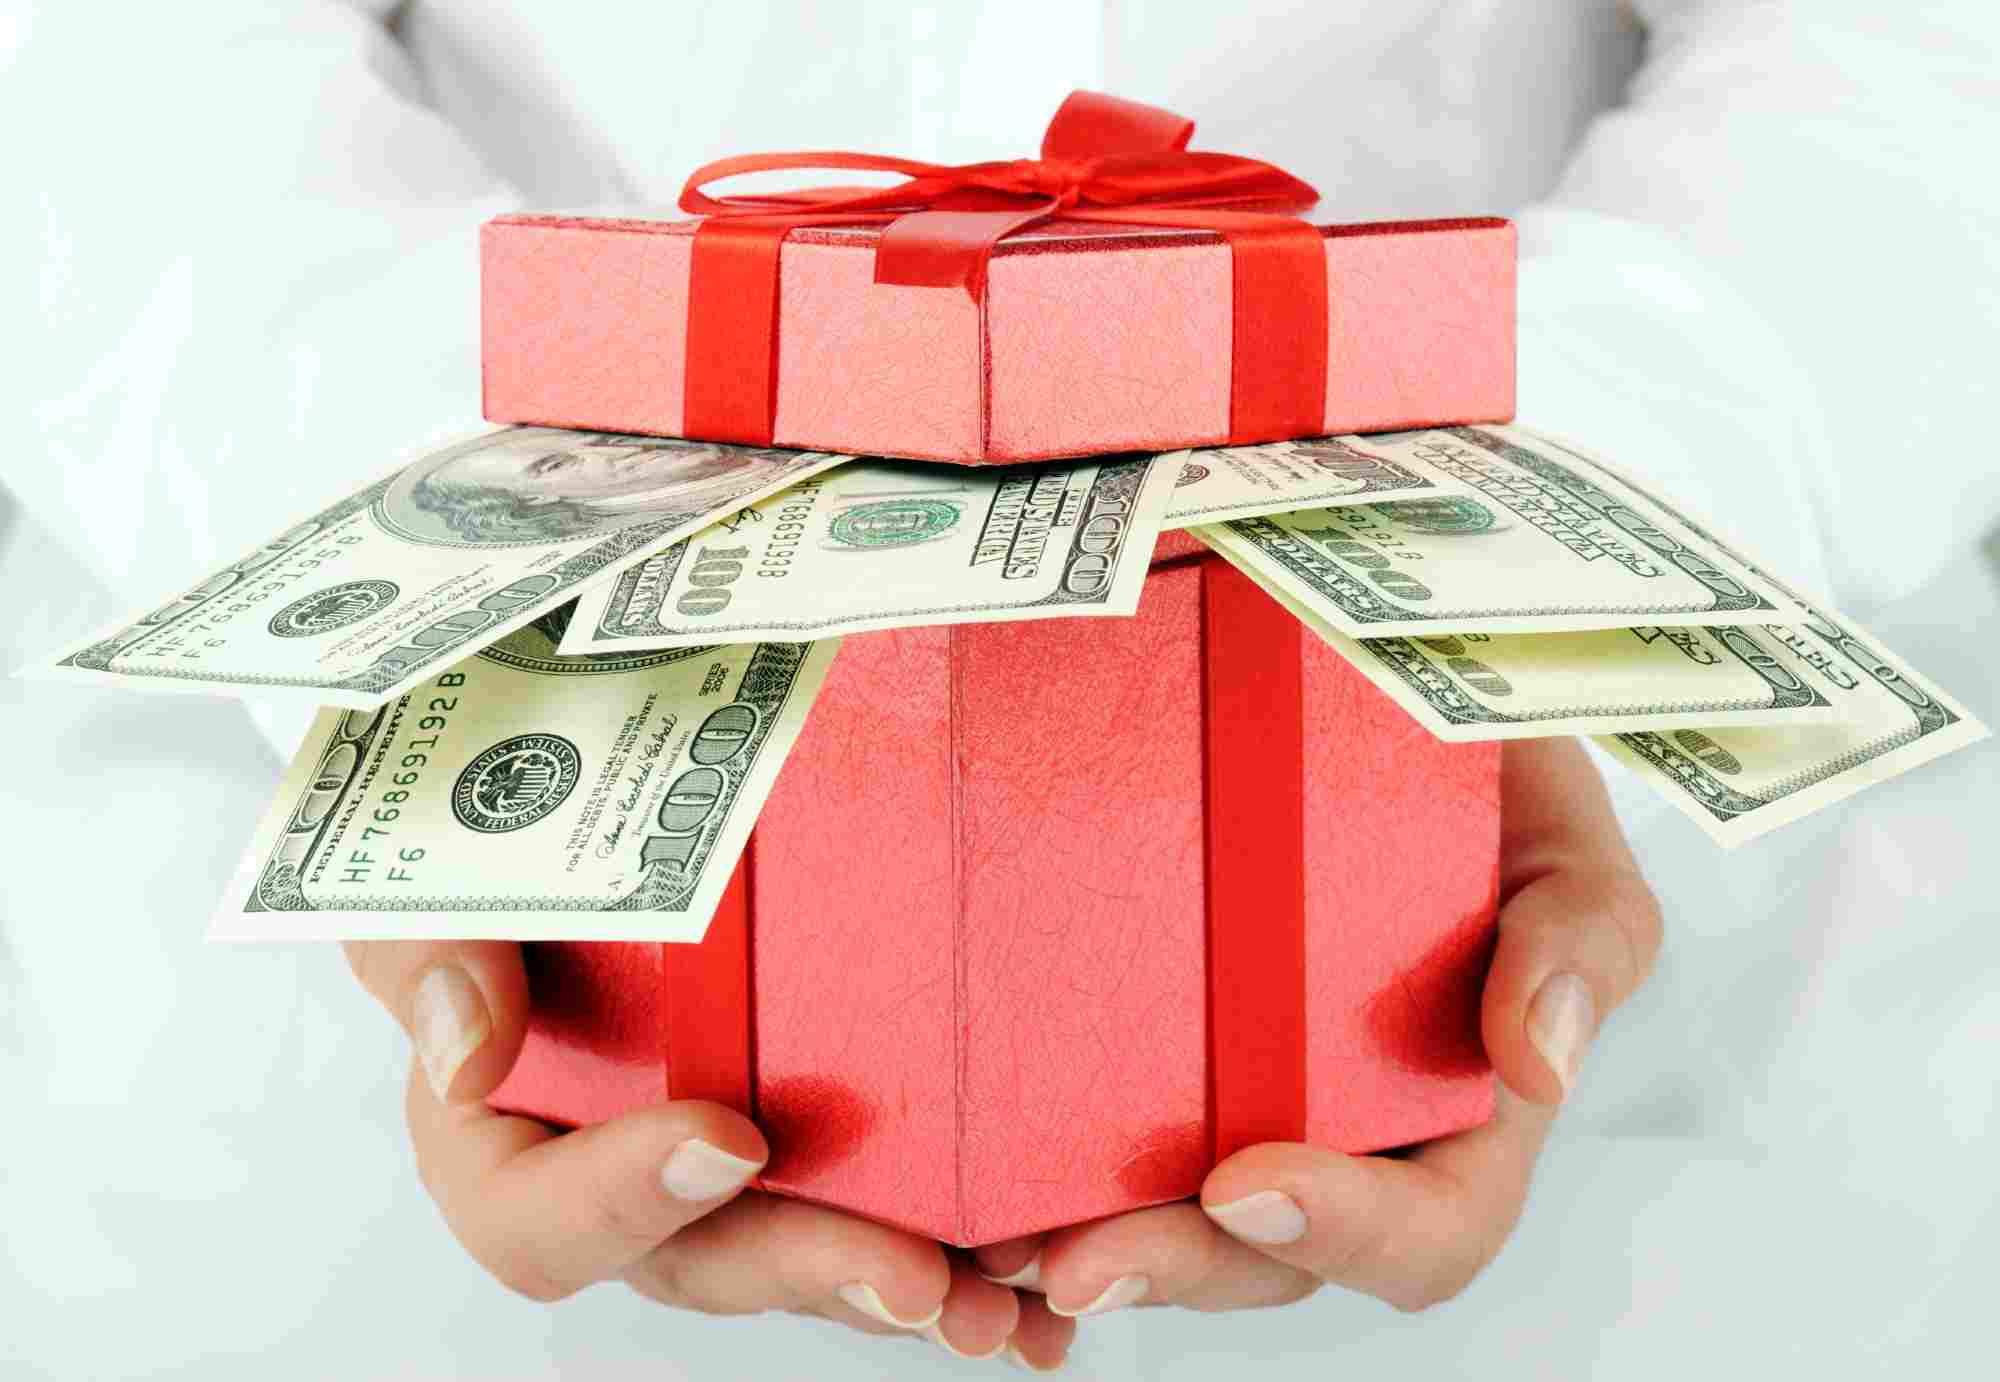 Кредит 100 без отказа через своих сотрудников банка